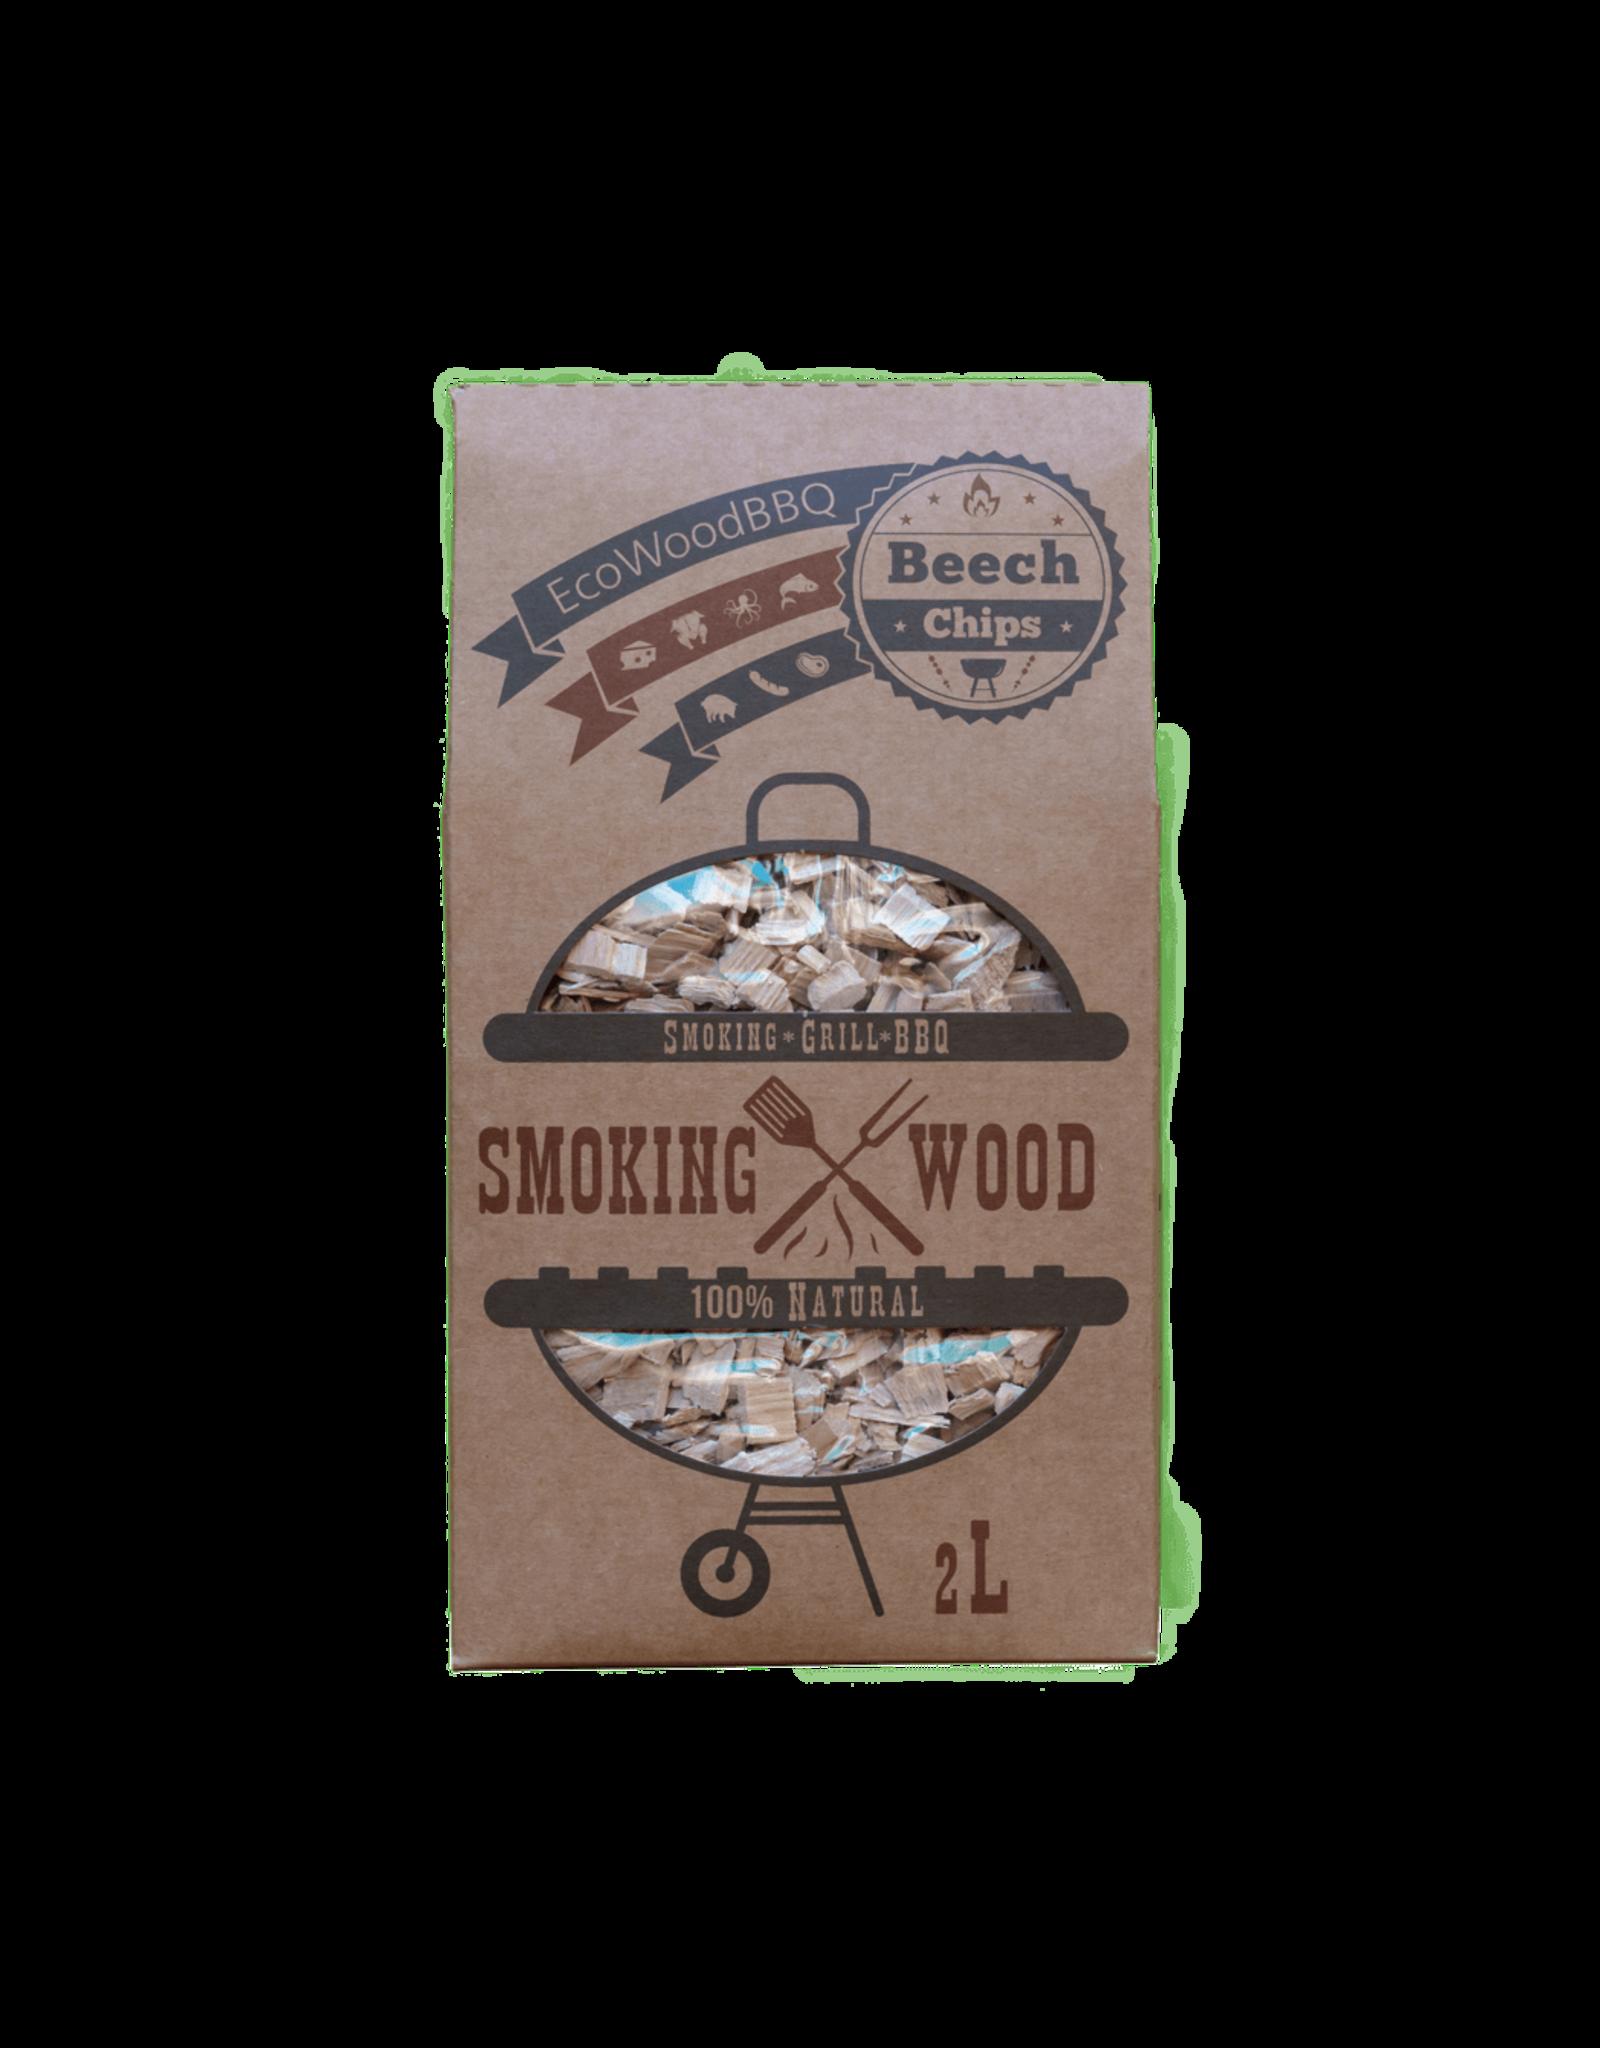 EcoWoodBBQ Rookhout chips BEUKEN - 2 Liter